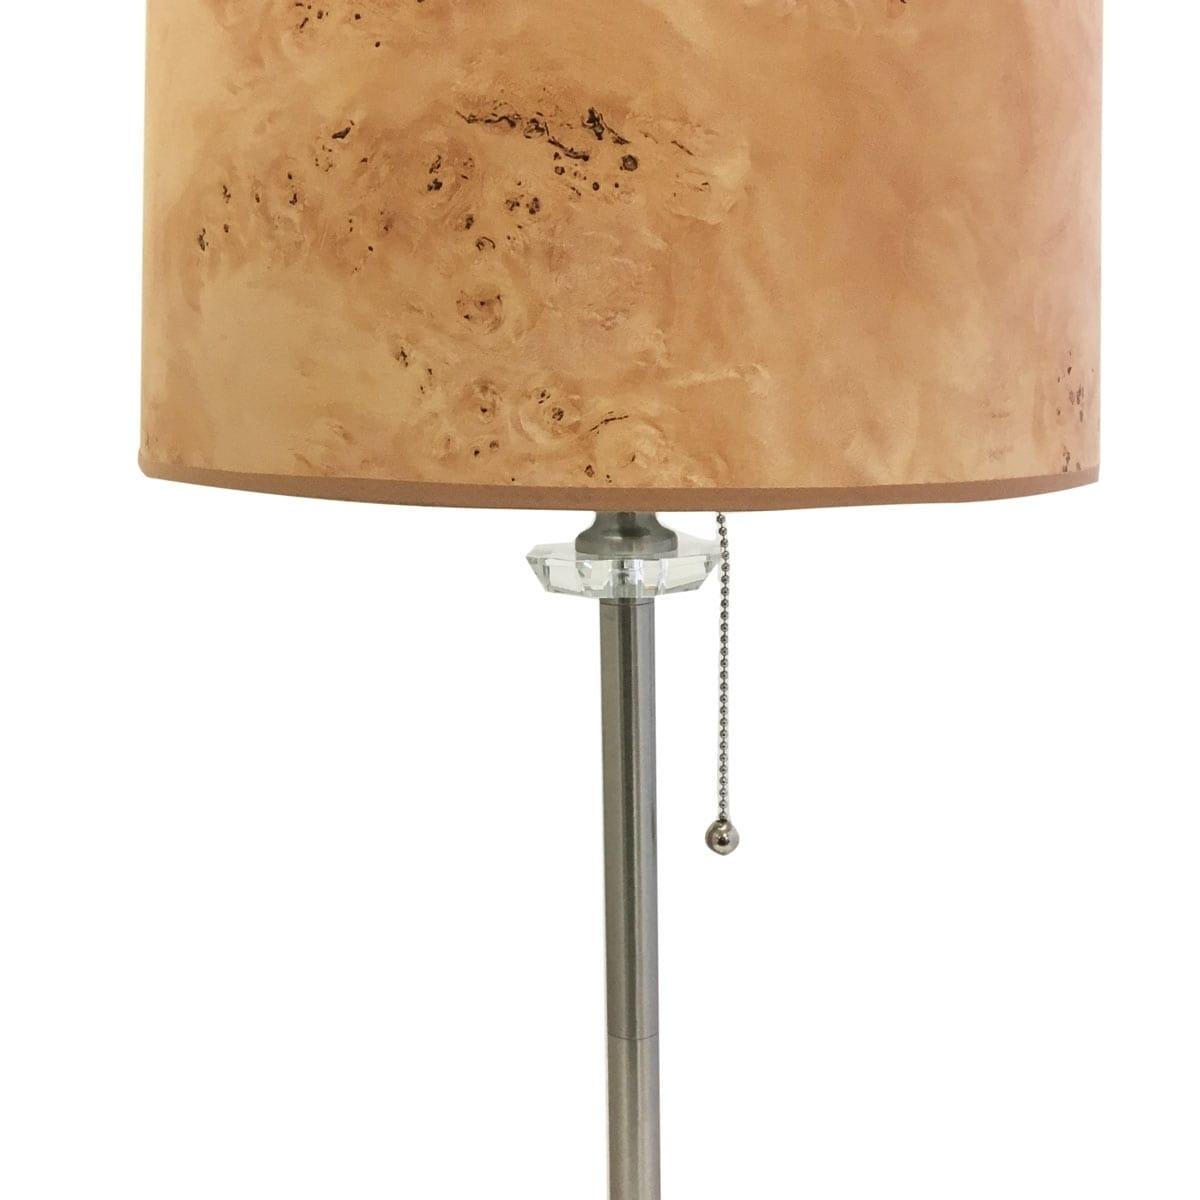 Royal Designs 28 Crystal and Brushed Nickel Lamp with Black Wood Texture Hardback Lamp Shade